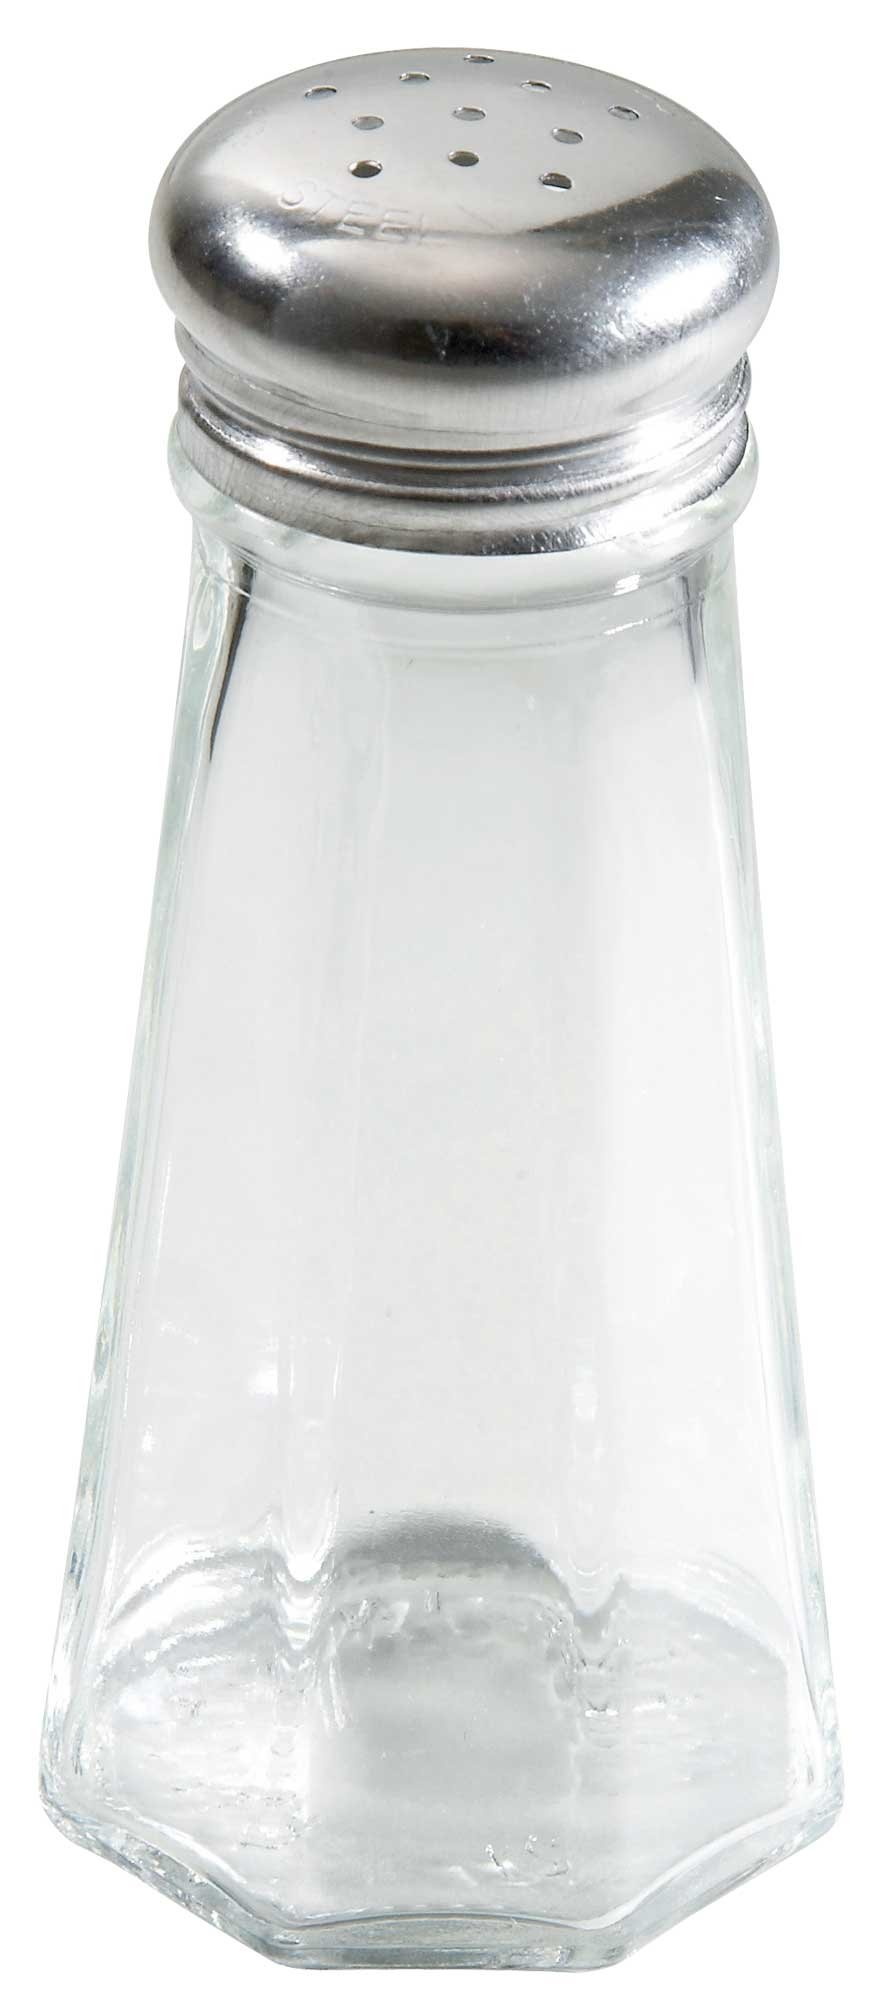 Winco 12-Piece Paneled Shaker with Mushroom Top, 3-Ounce